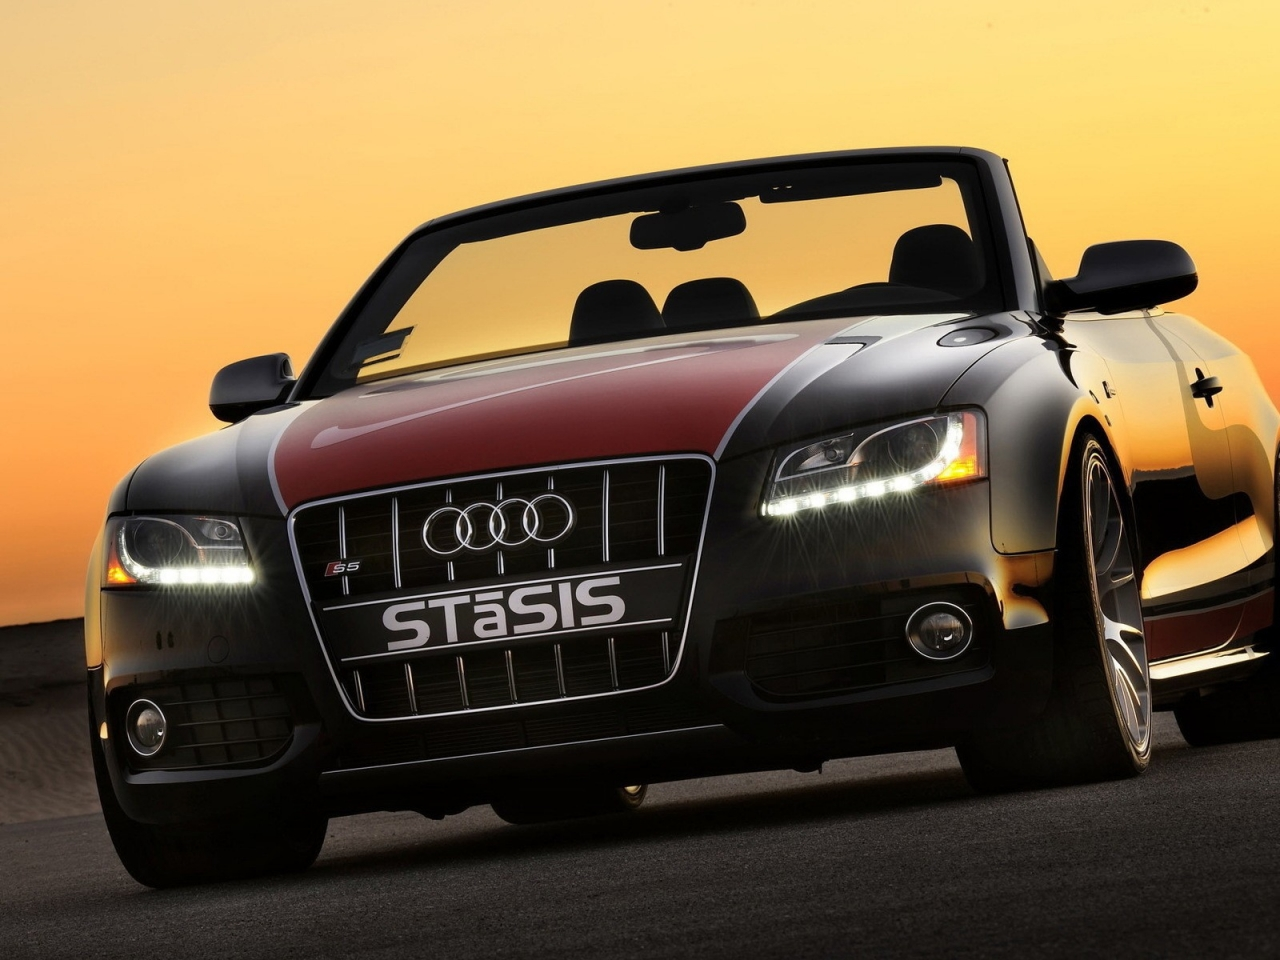 Audi Stasis 2014 - 1280x960